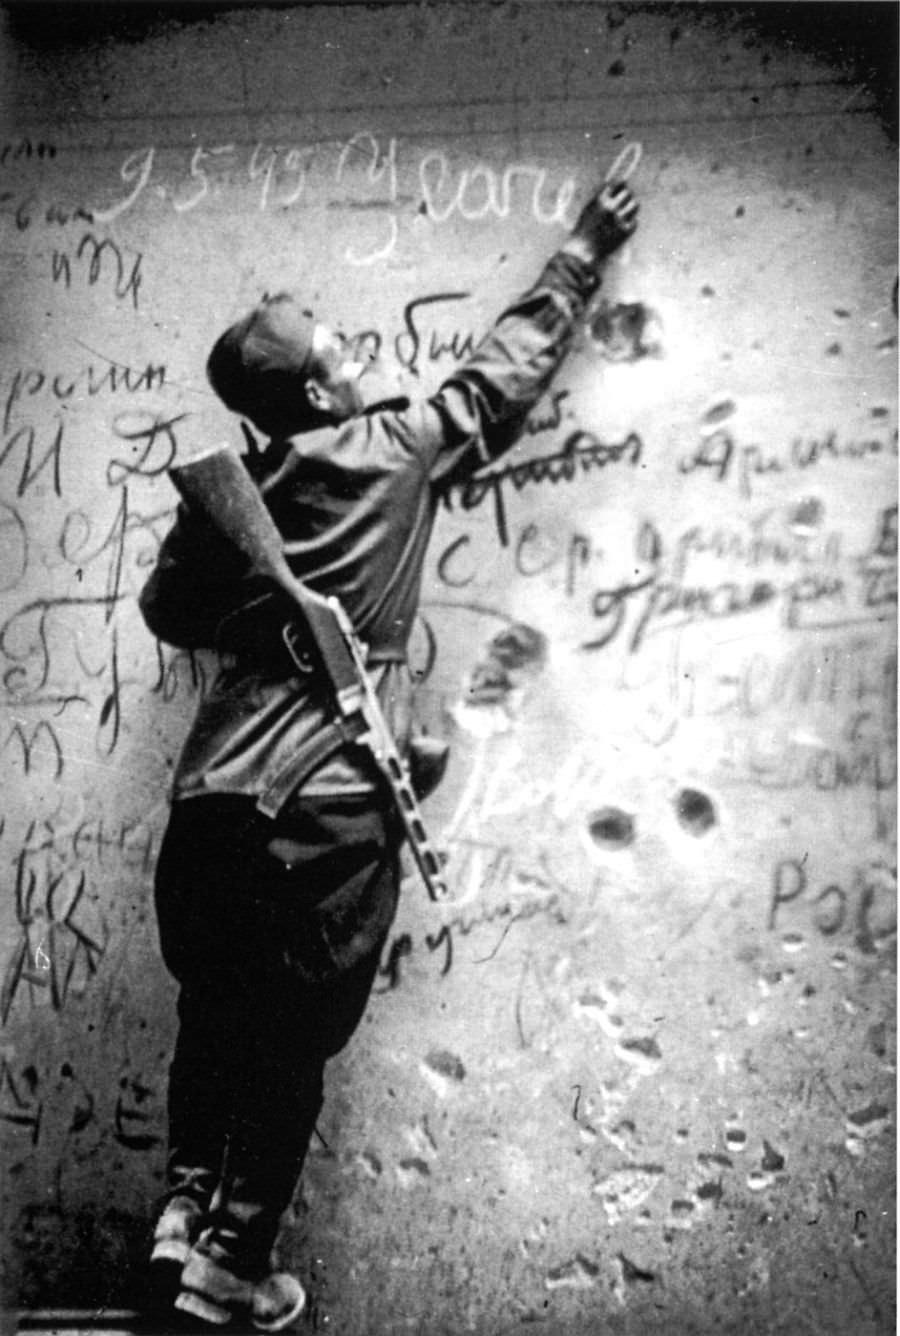 Красноармеец расписывается на стене рейхстага